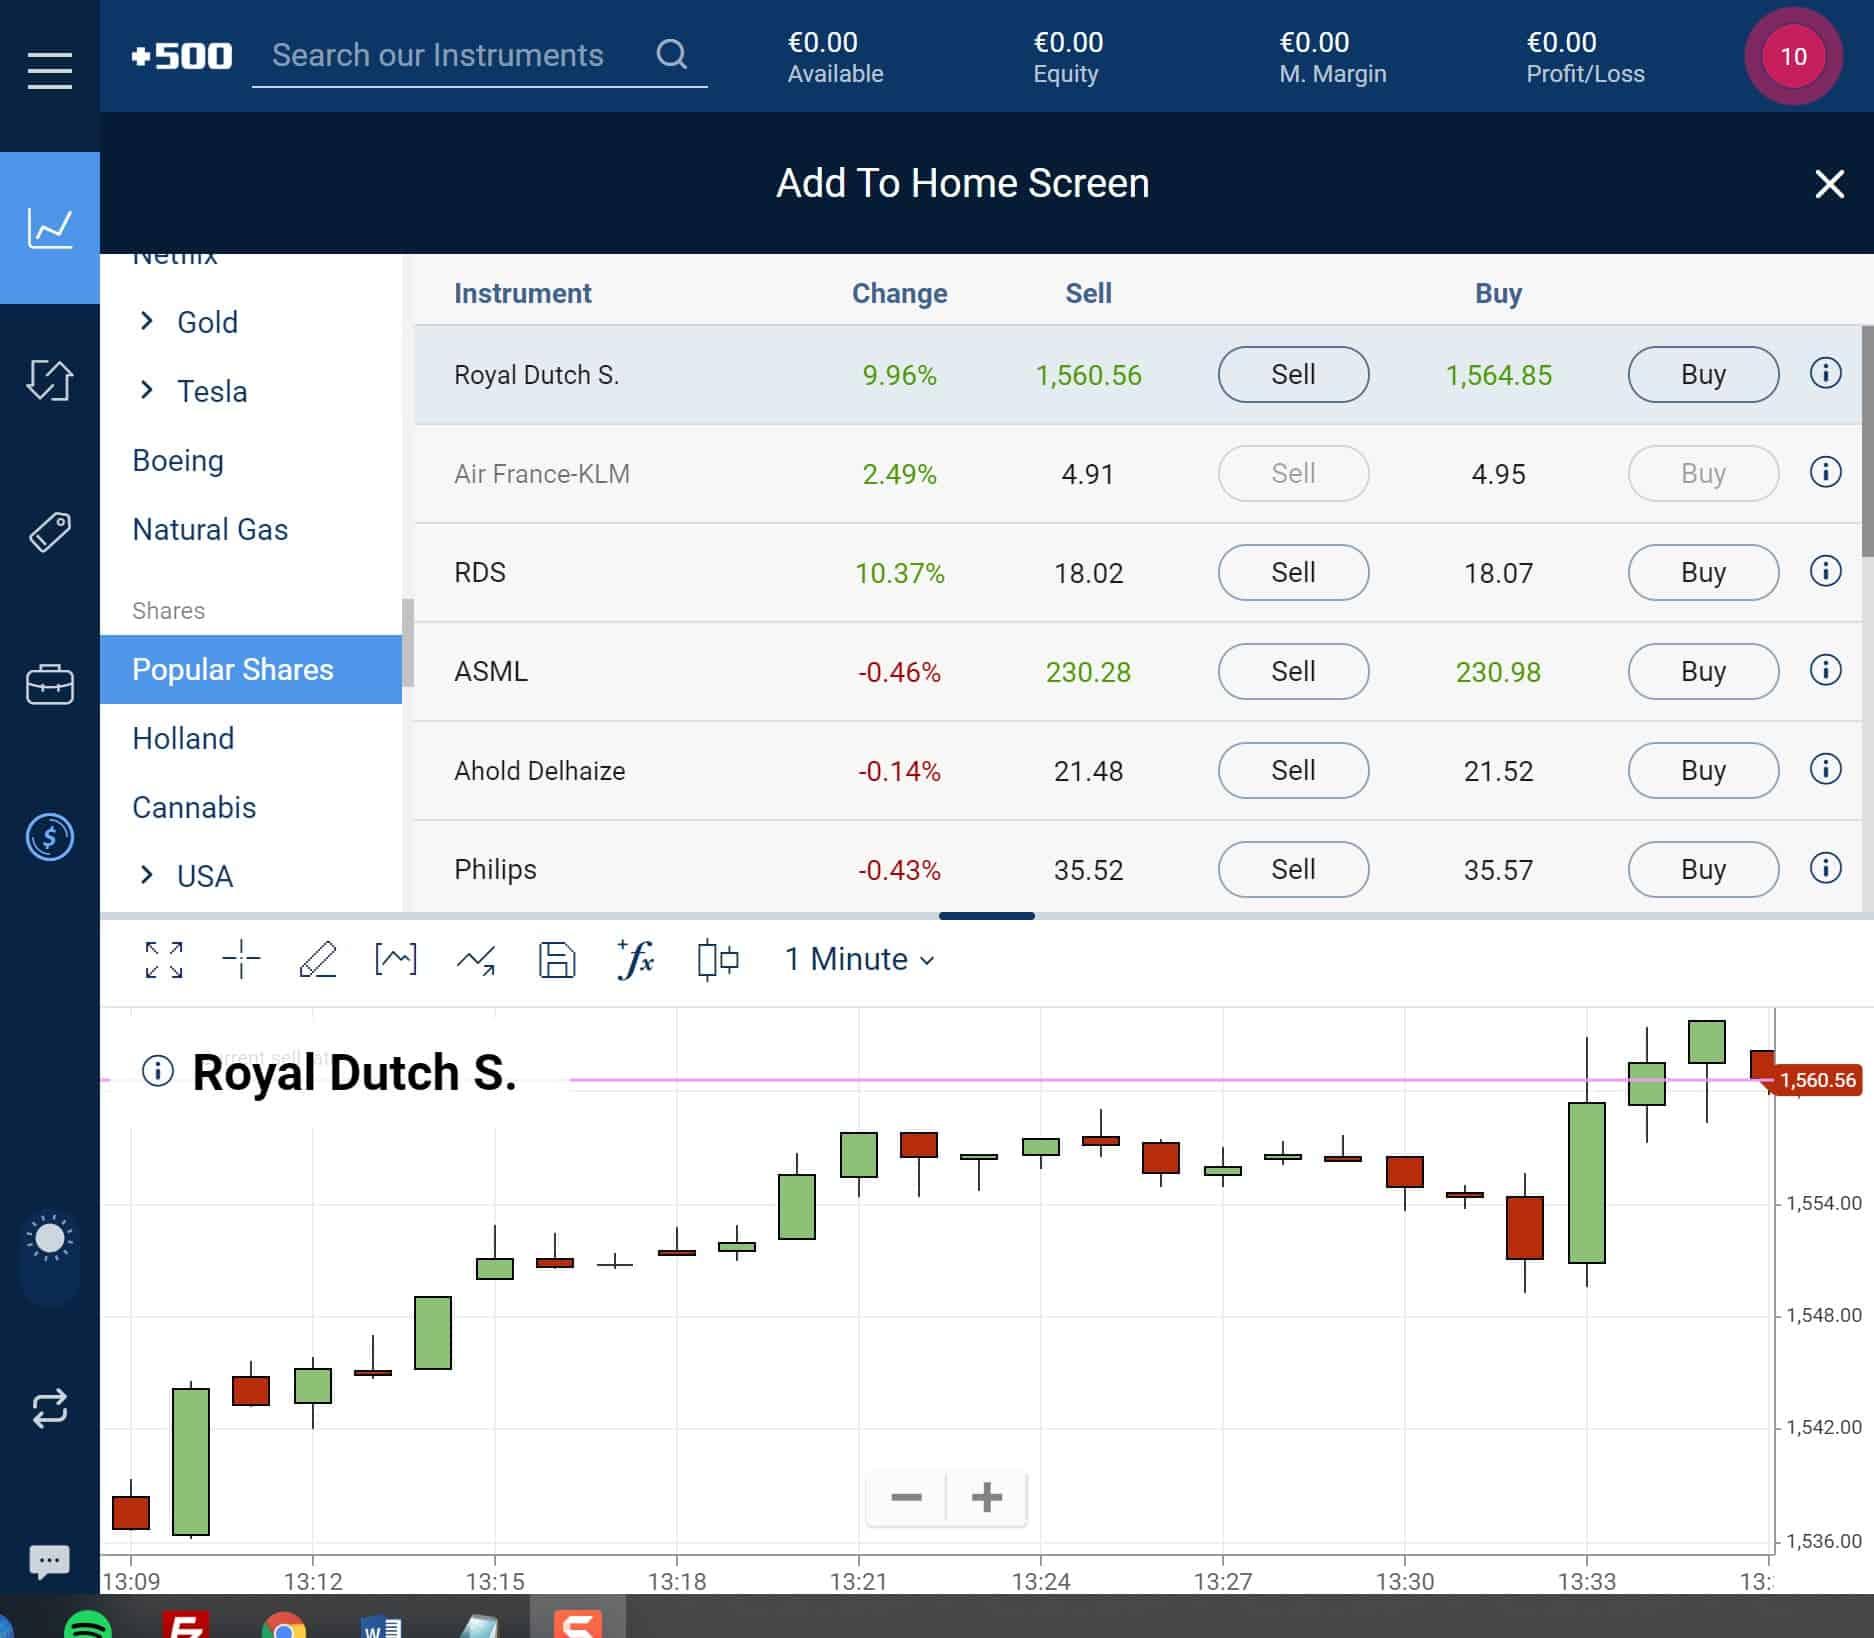 Plus500 stock platform